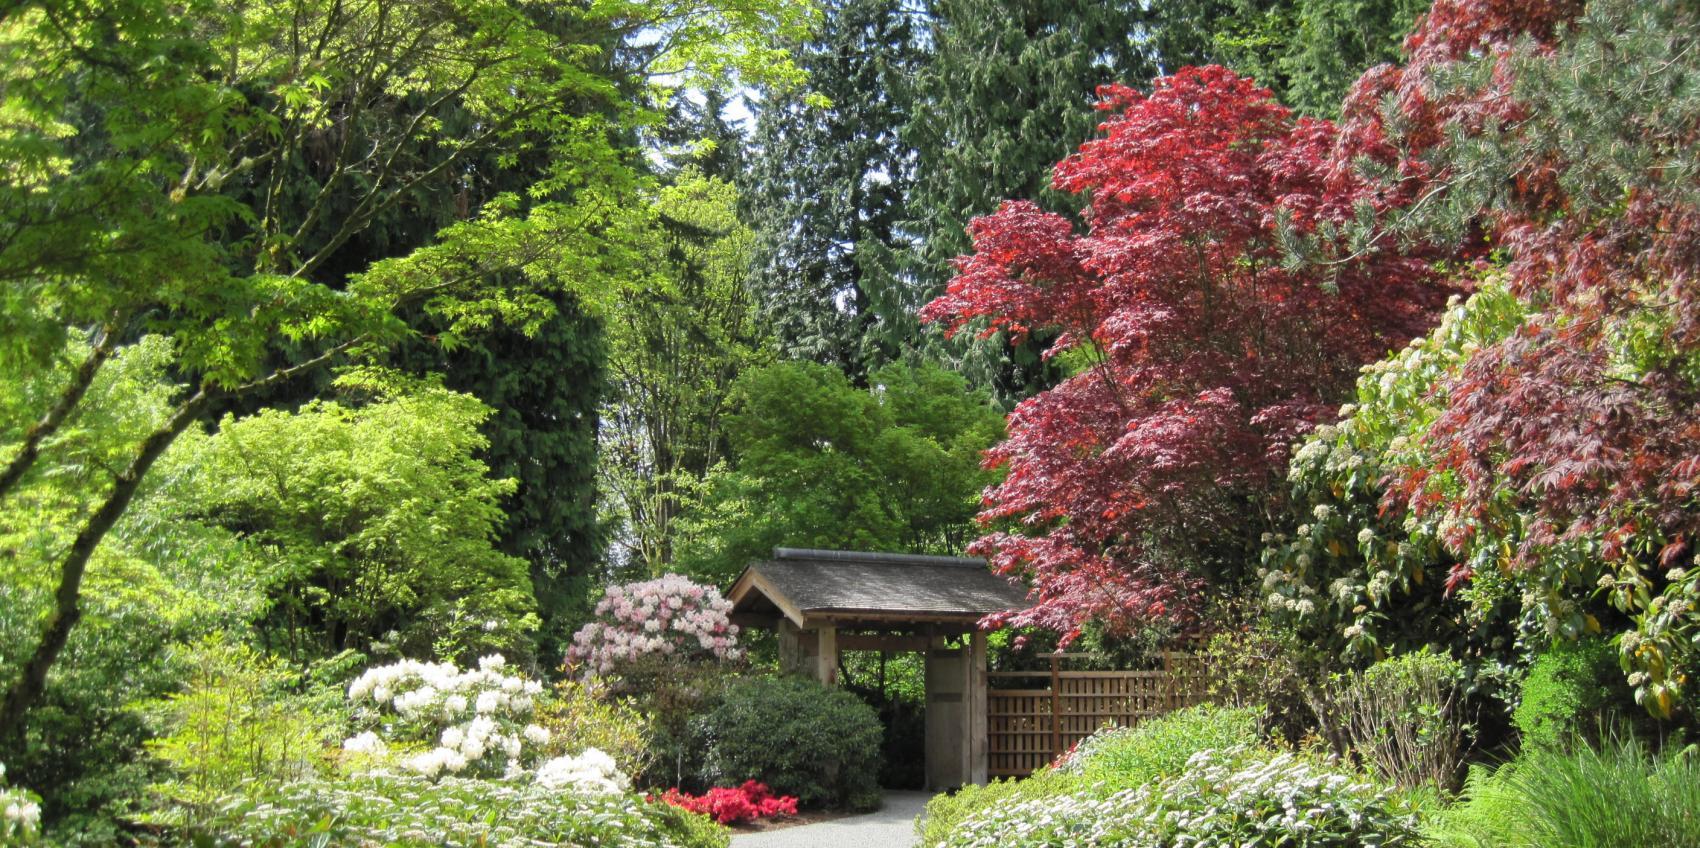 Bellevue botanical garden american public gardens association for Bellevue botanical garden lights